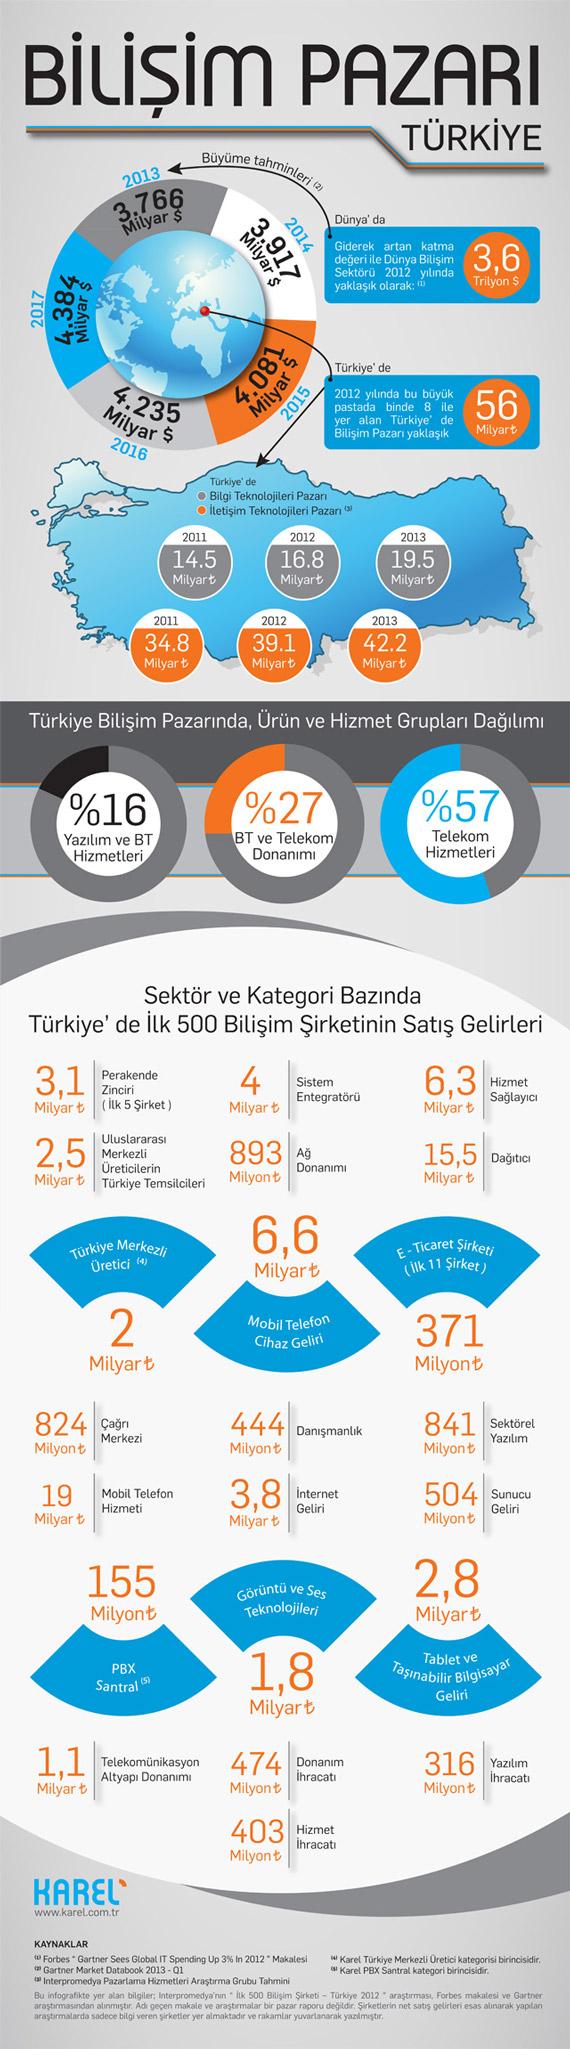 bilisim-pazari-turkiye-info